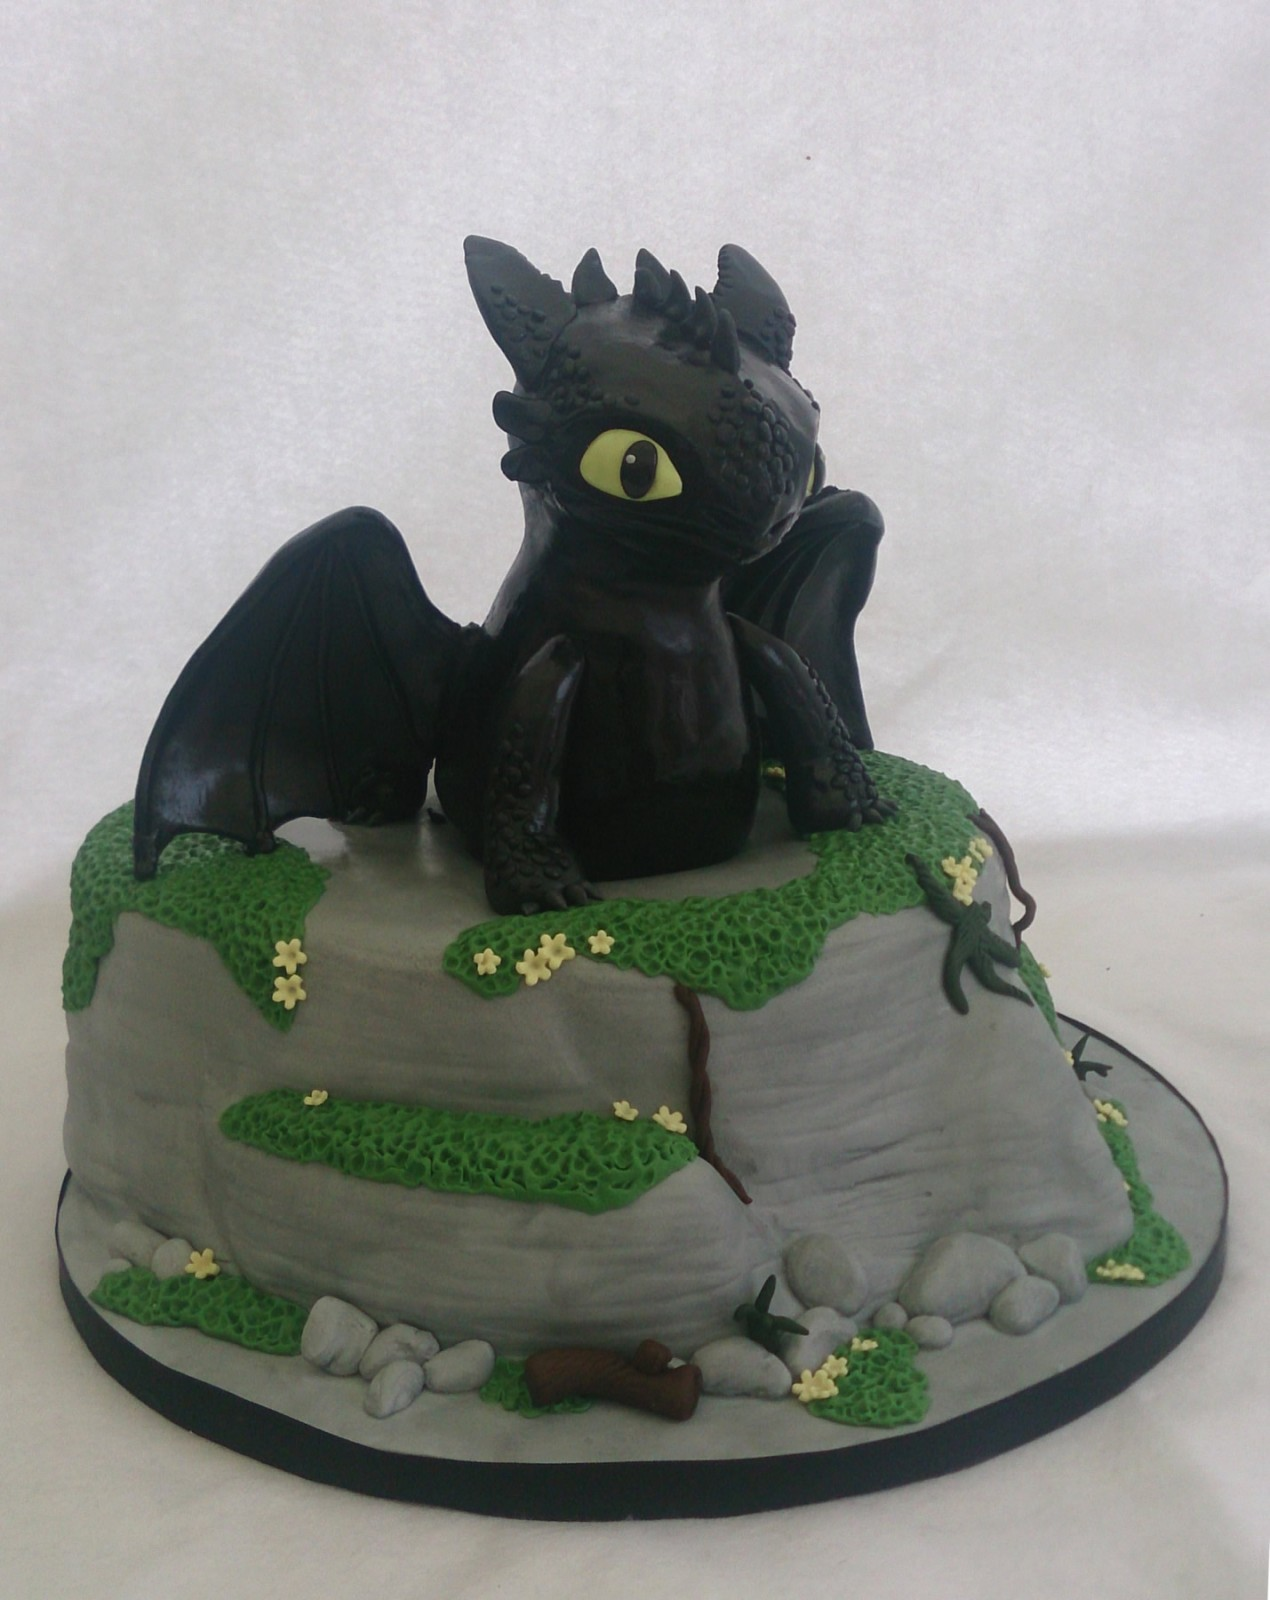 Brilliant Toothless The Dragon Birthday Cake Susies Cakes Personalised Birthday Cards Veneteletsinfo